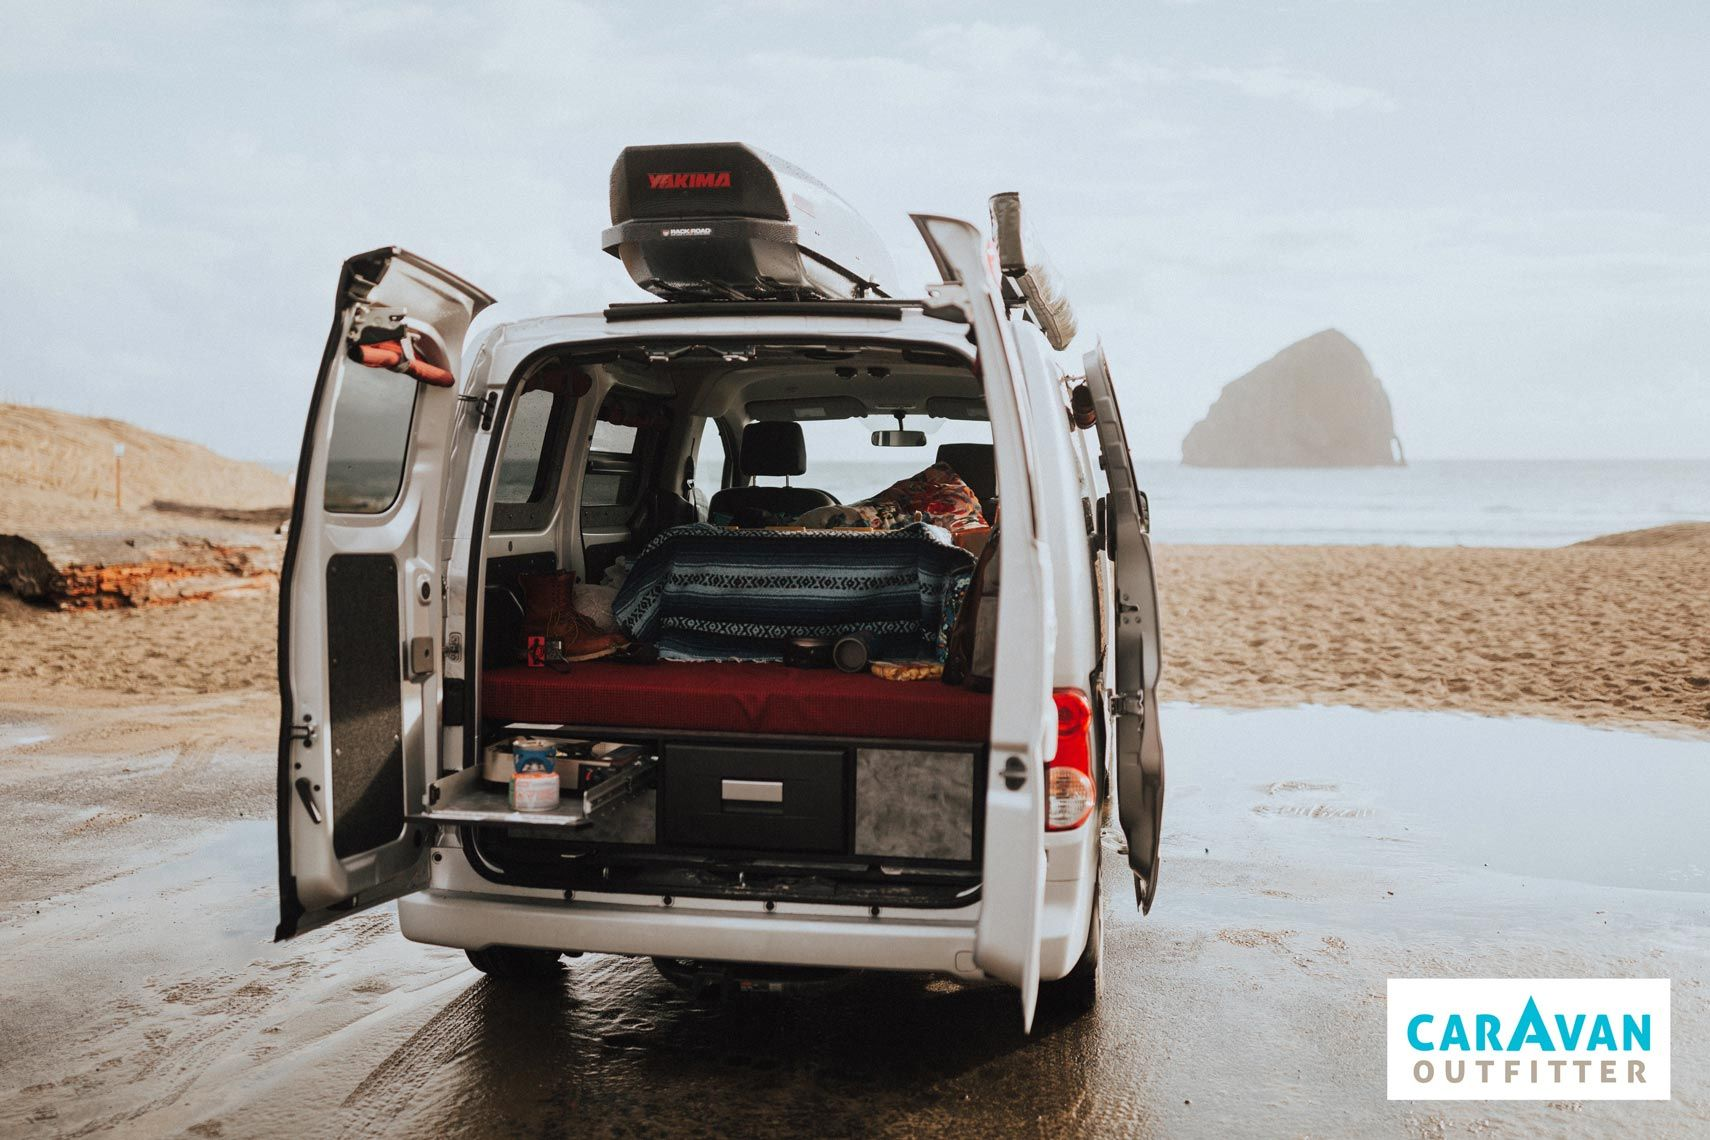 Caravan Outfitters Nissan Nv200 Free Bird Camper Improb Nissan Vans Nissan Camper